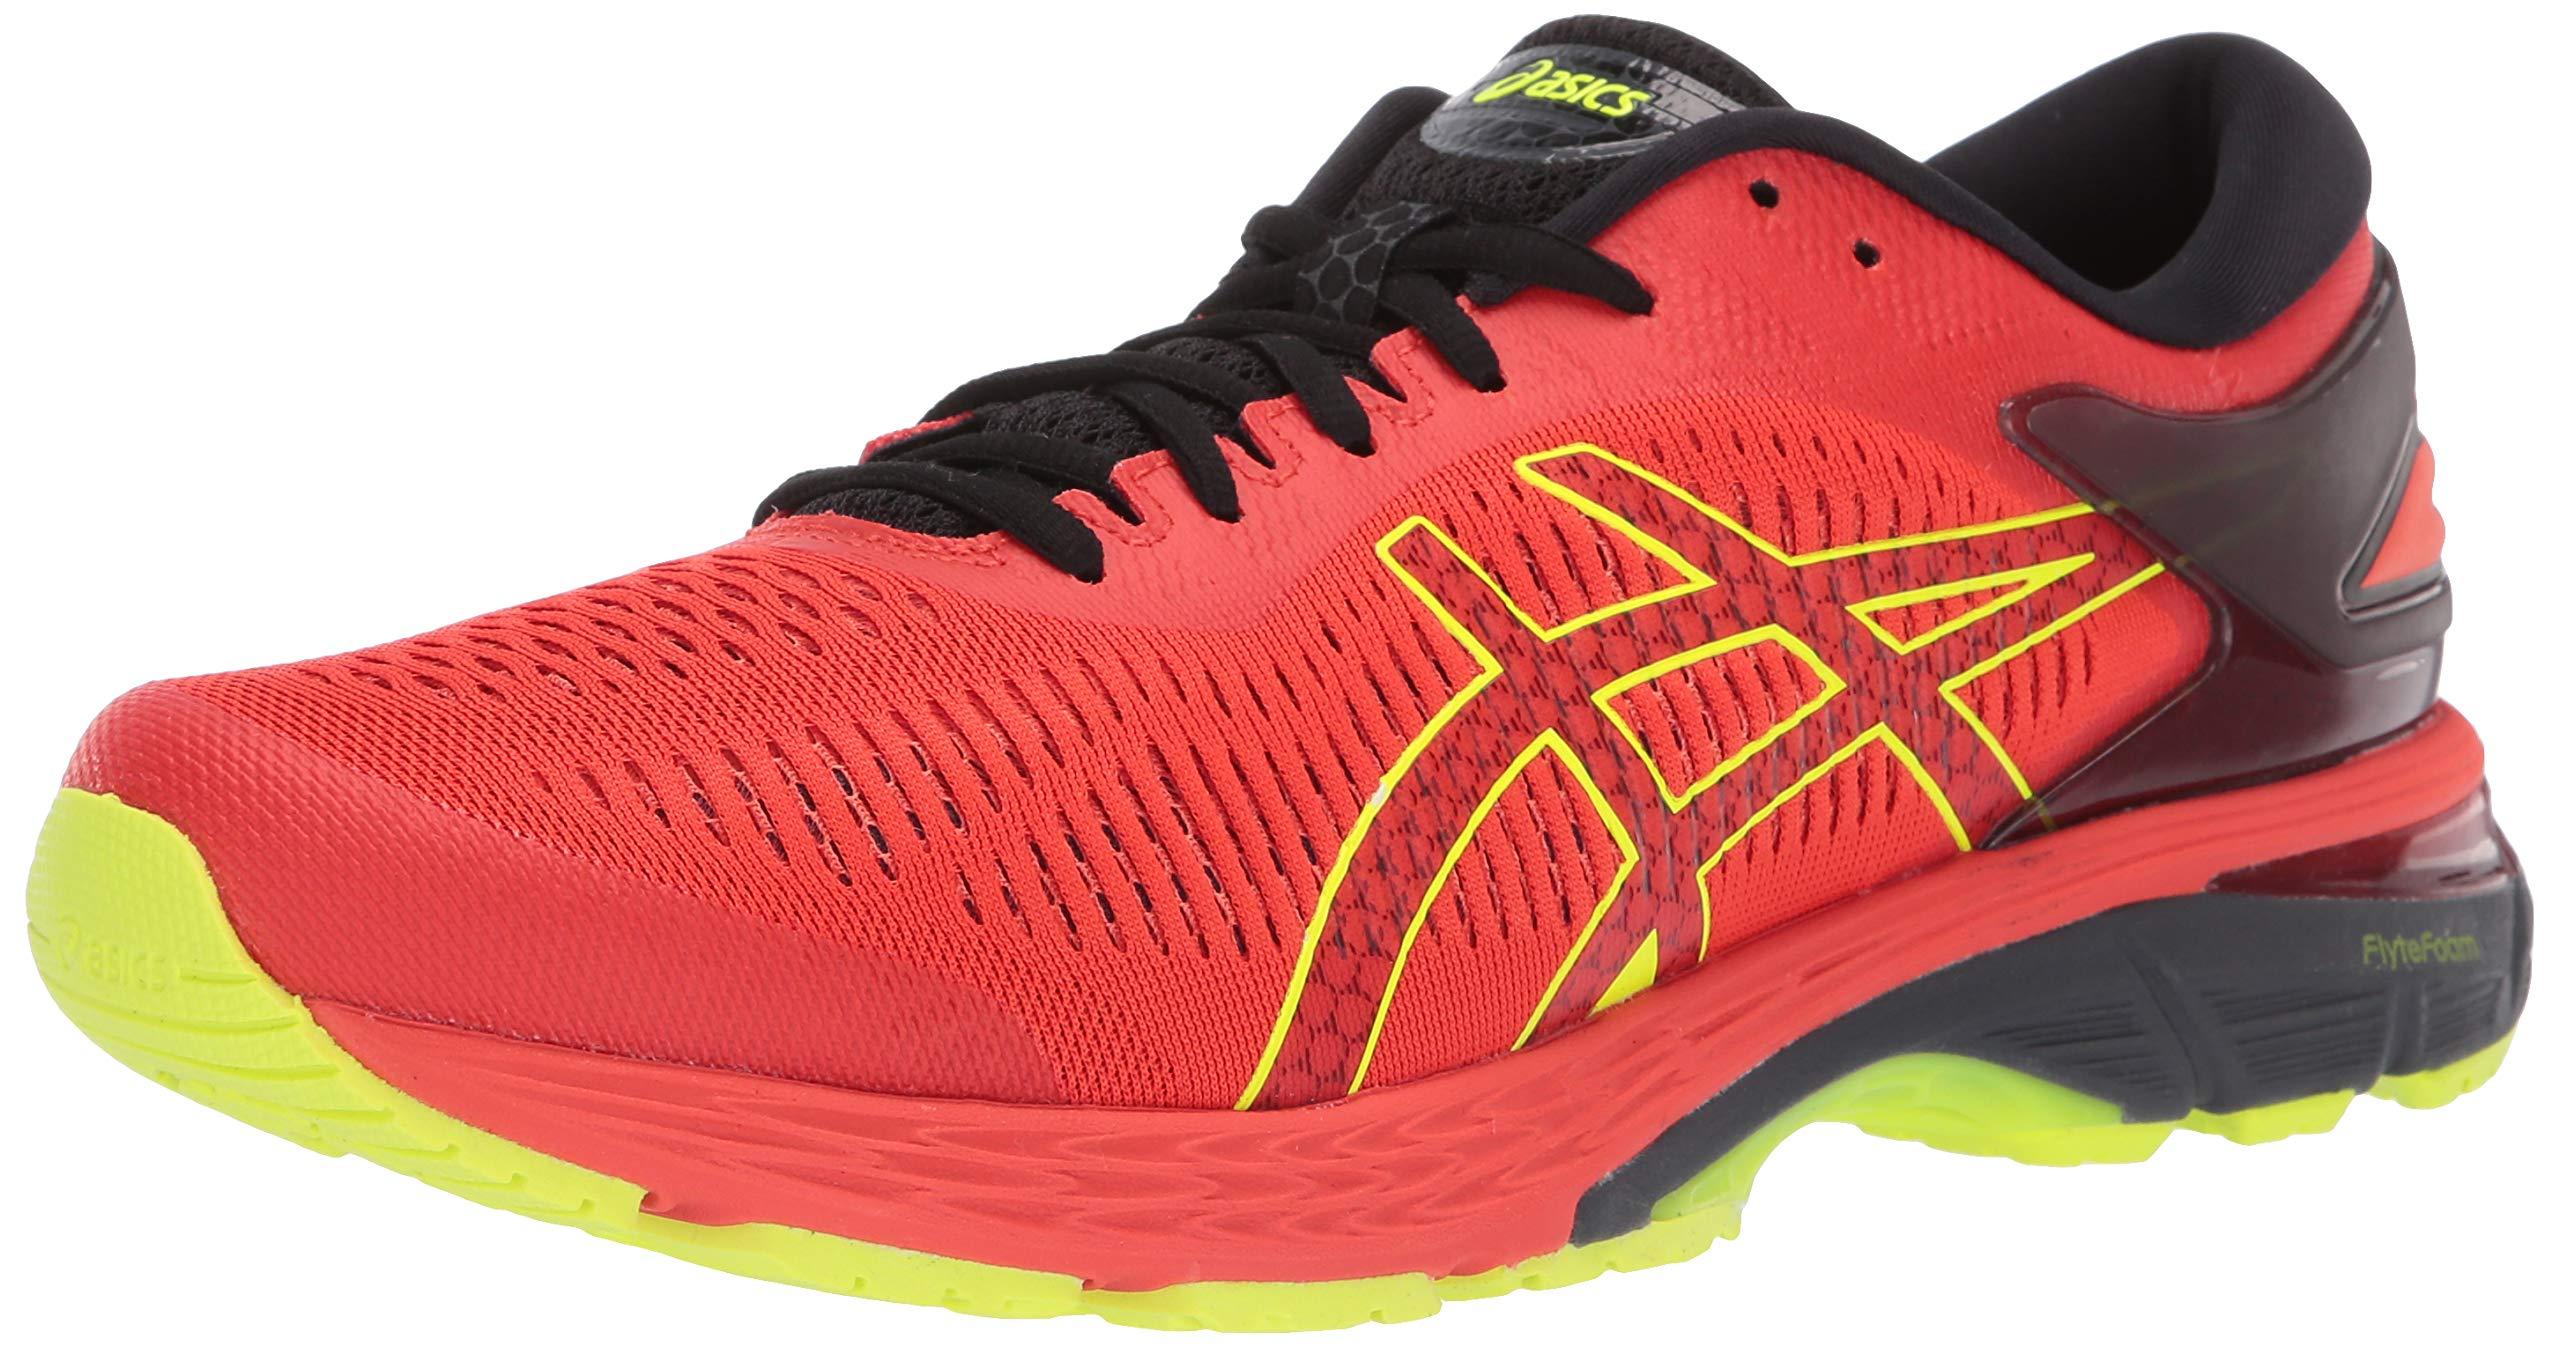 ASICS Gel-Kayano 25 Men's Running Shoe, Cherry Tomato/Black, 10 D US